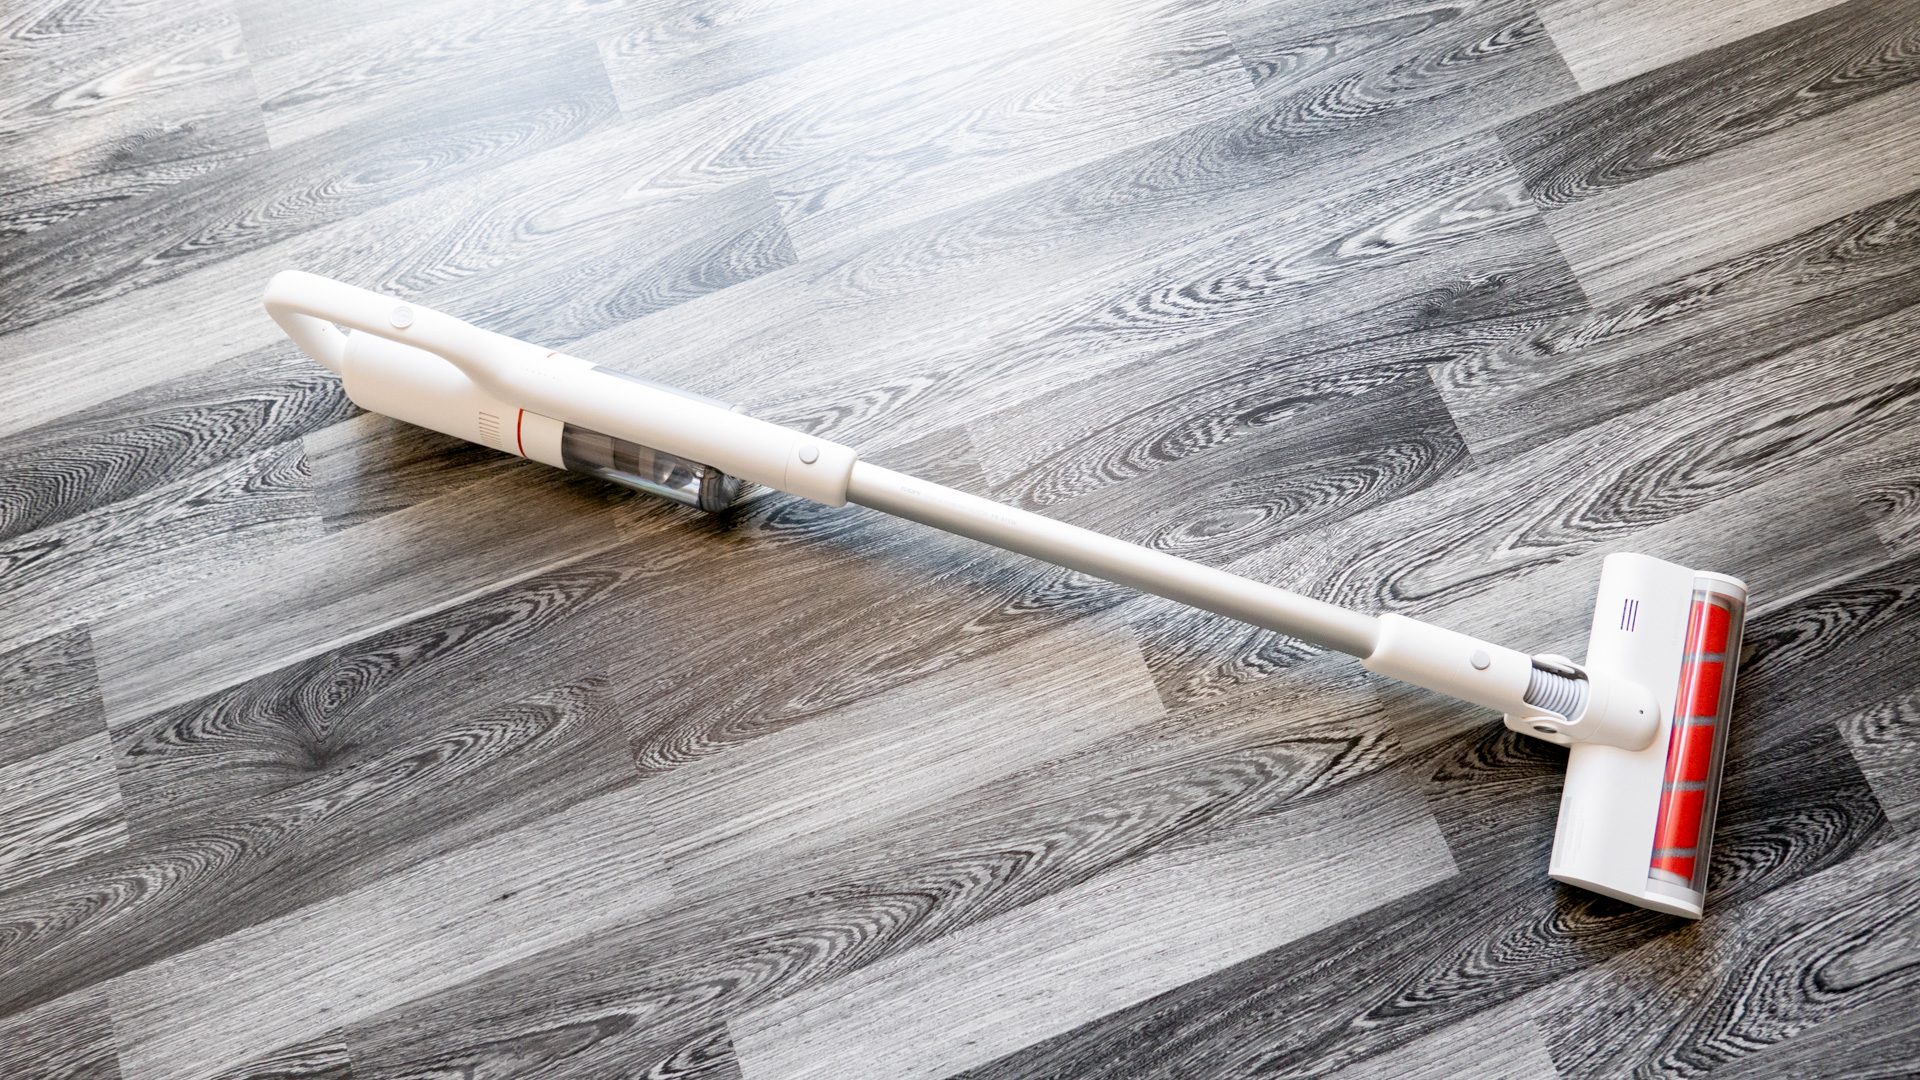 gearbest xiaomi staubsauger roboter deals. Black Bedroom Furniture Sets. Home Design Ideas